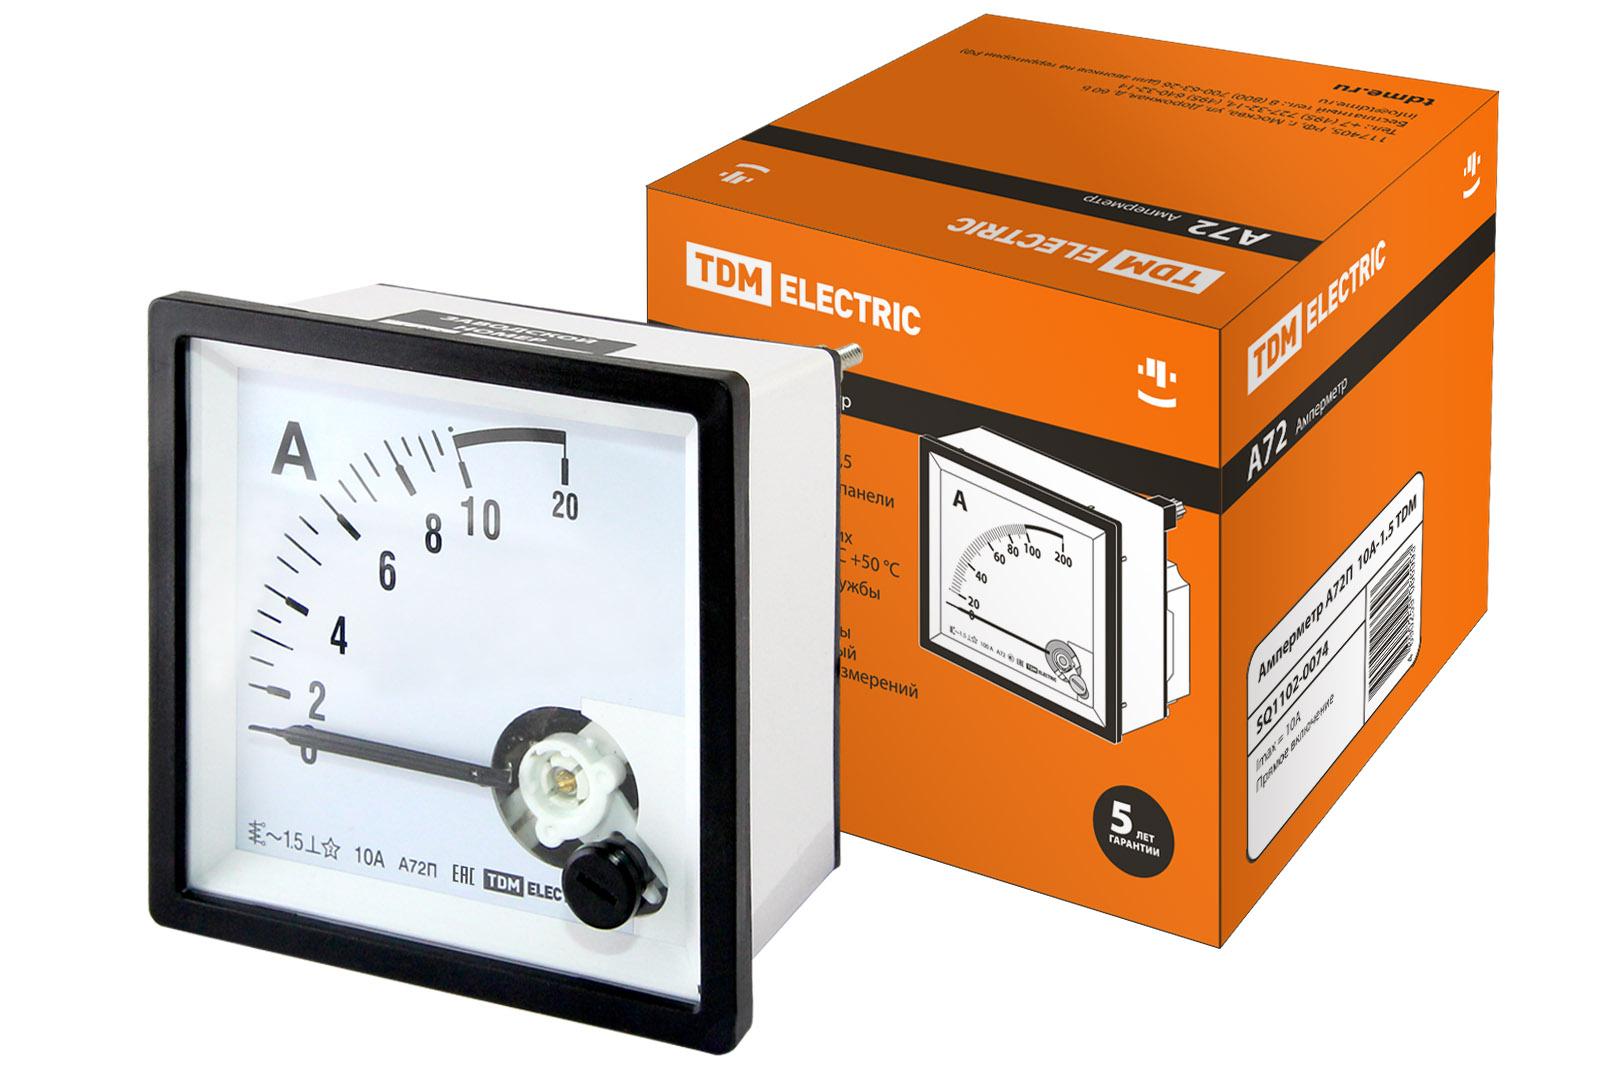 Амперметр А72П 10А-1.5 TDM SQ1102-0074 TDM Electric